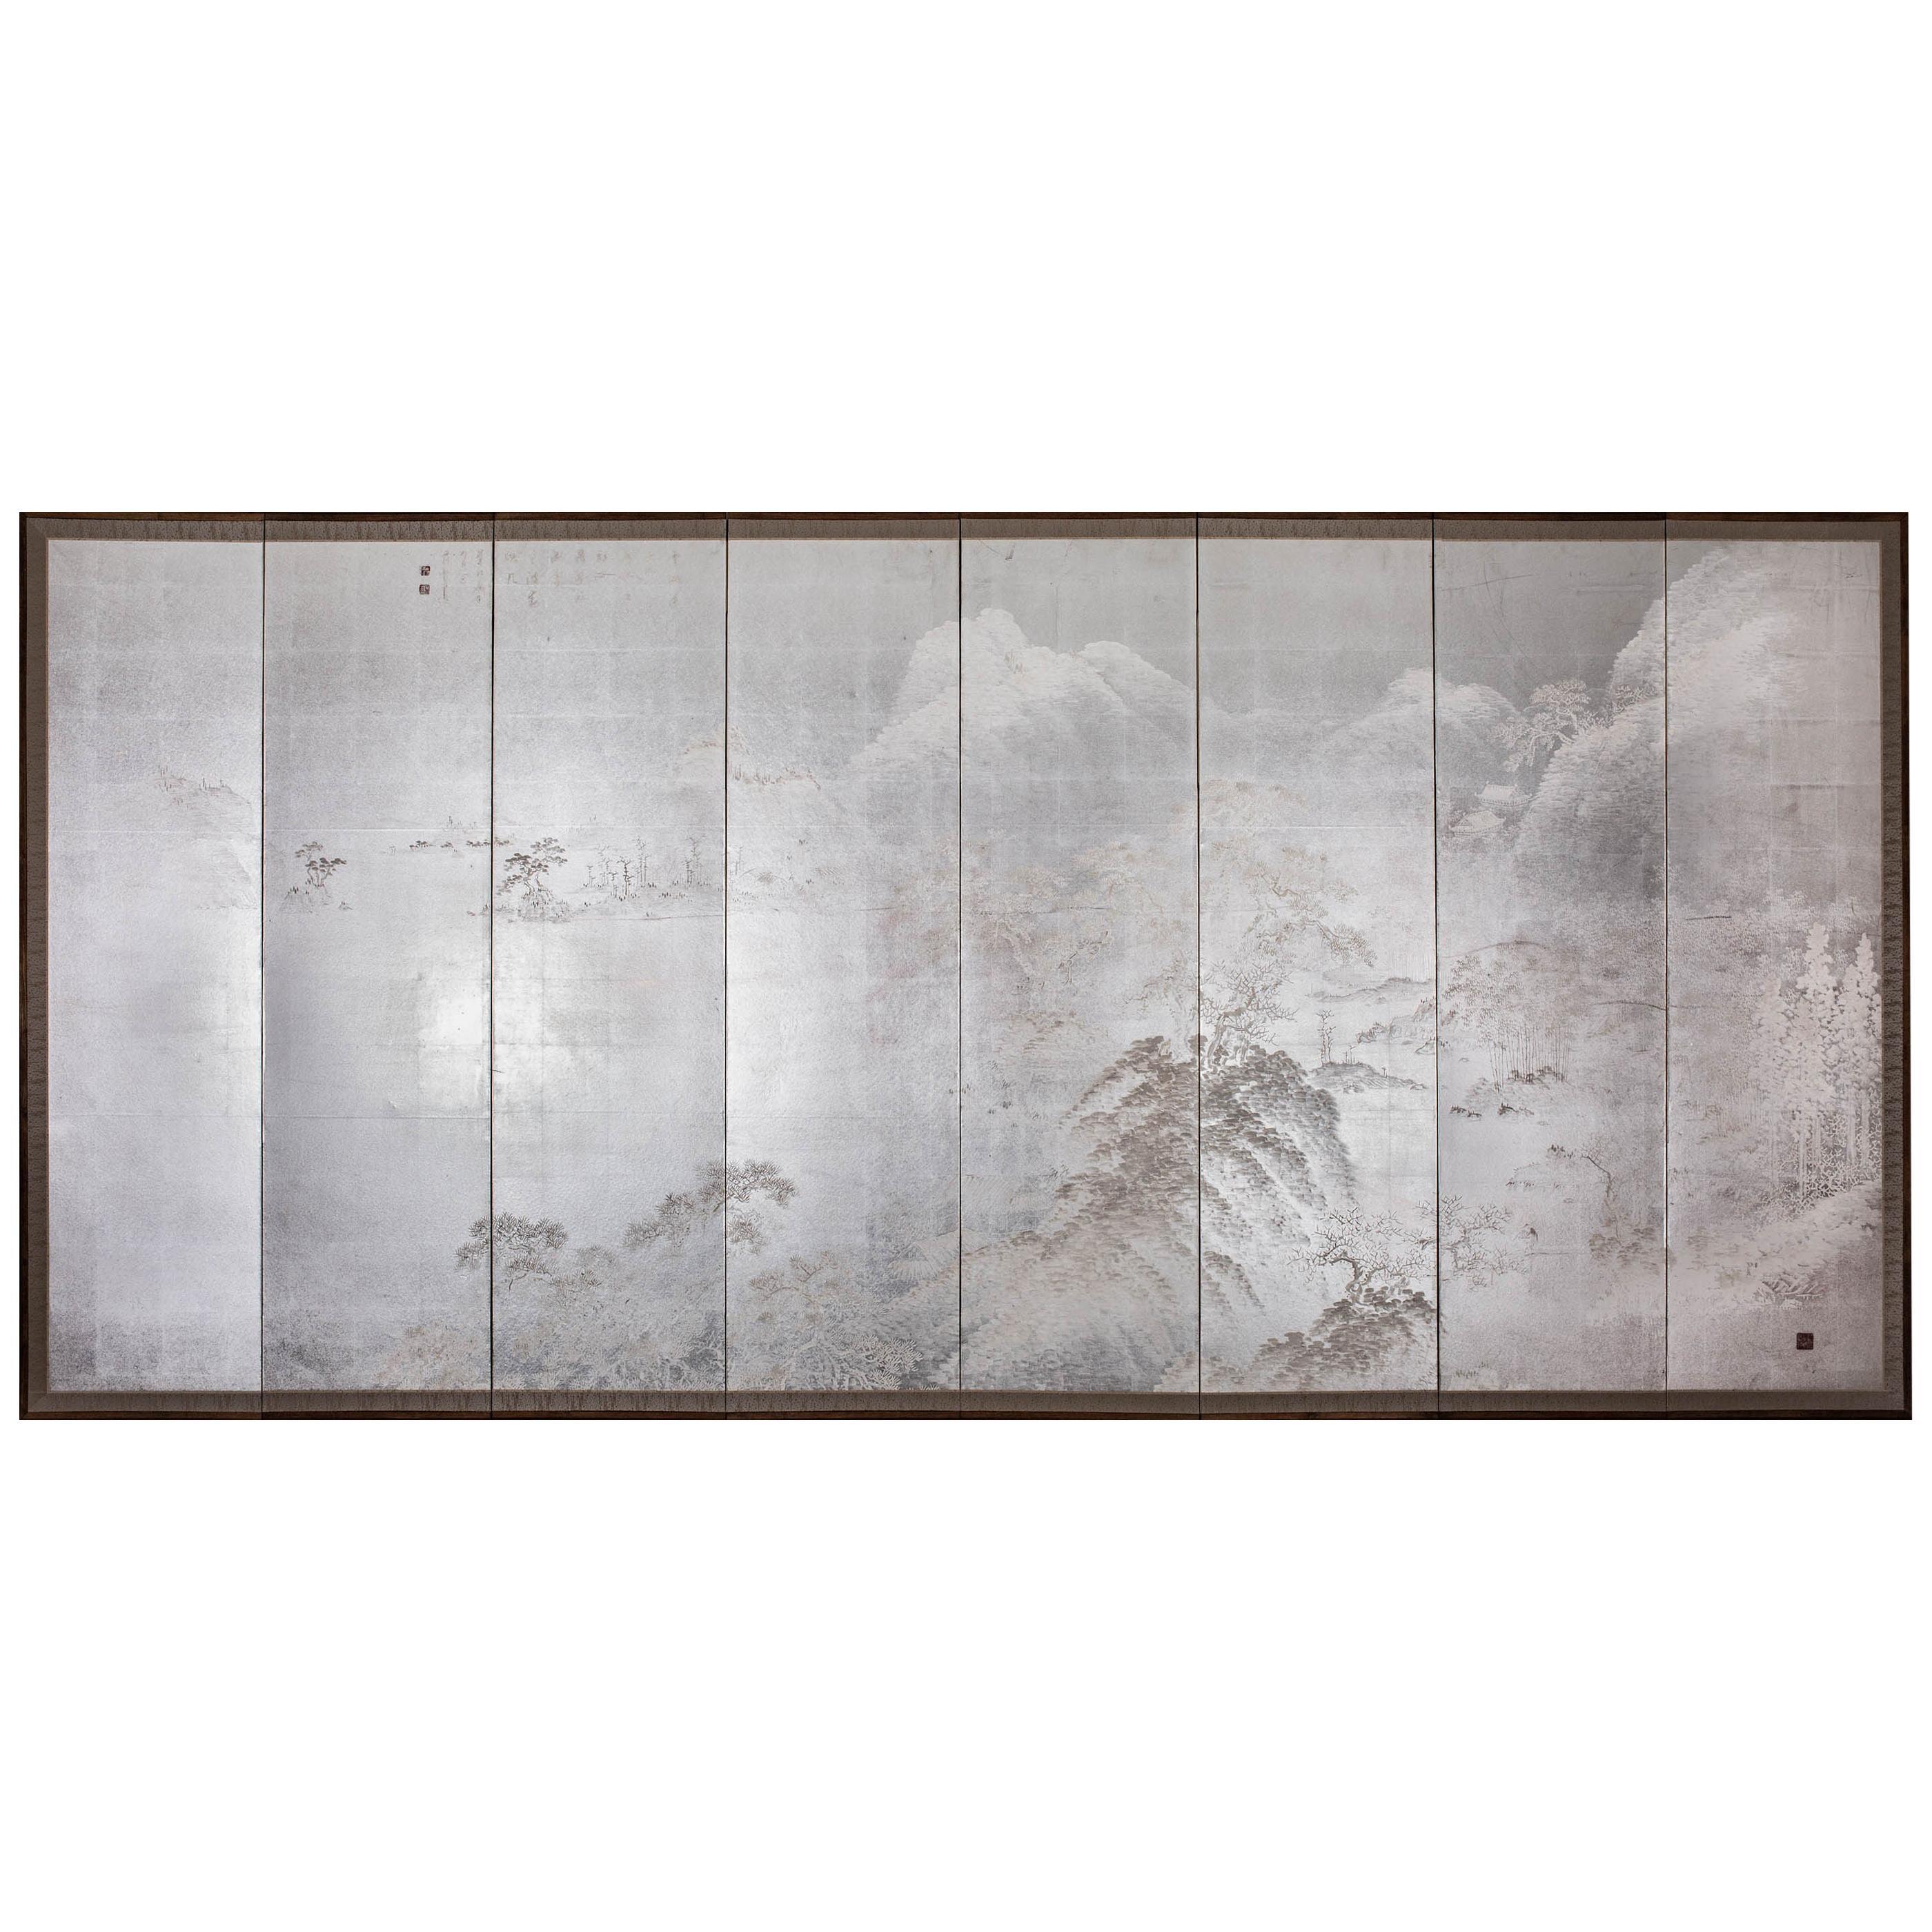 Japanese Eight Panel Screen: Modern Chinese School Coastal Mountain Landscape